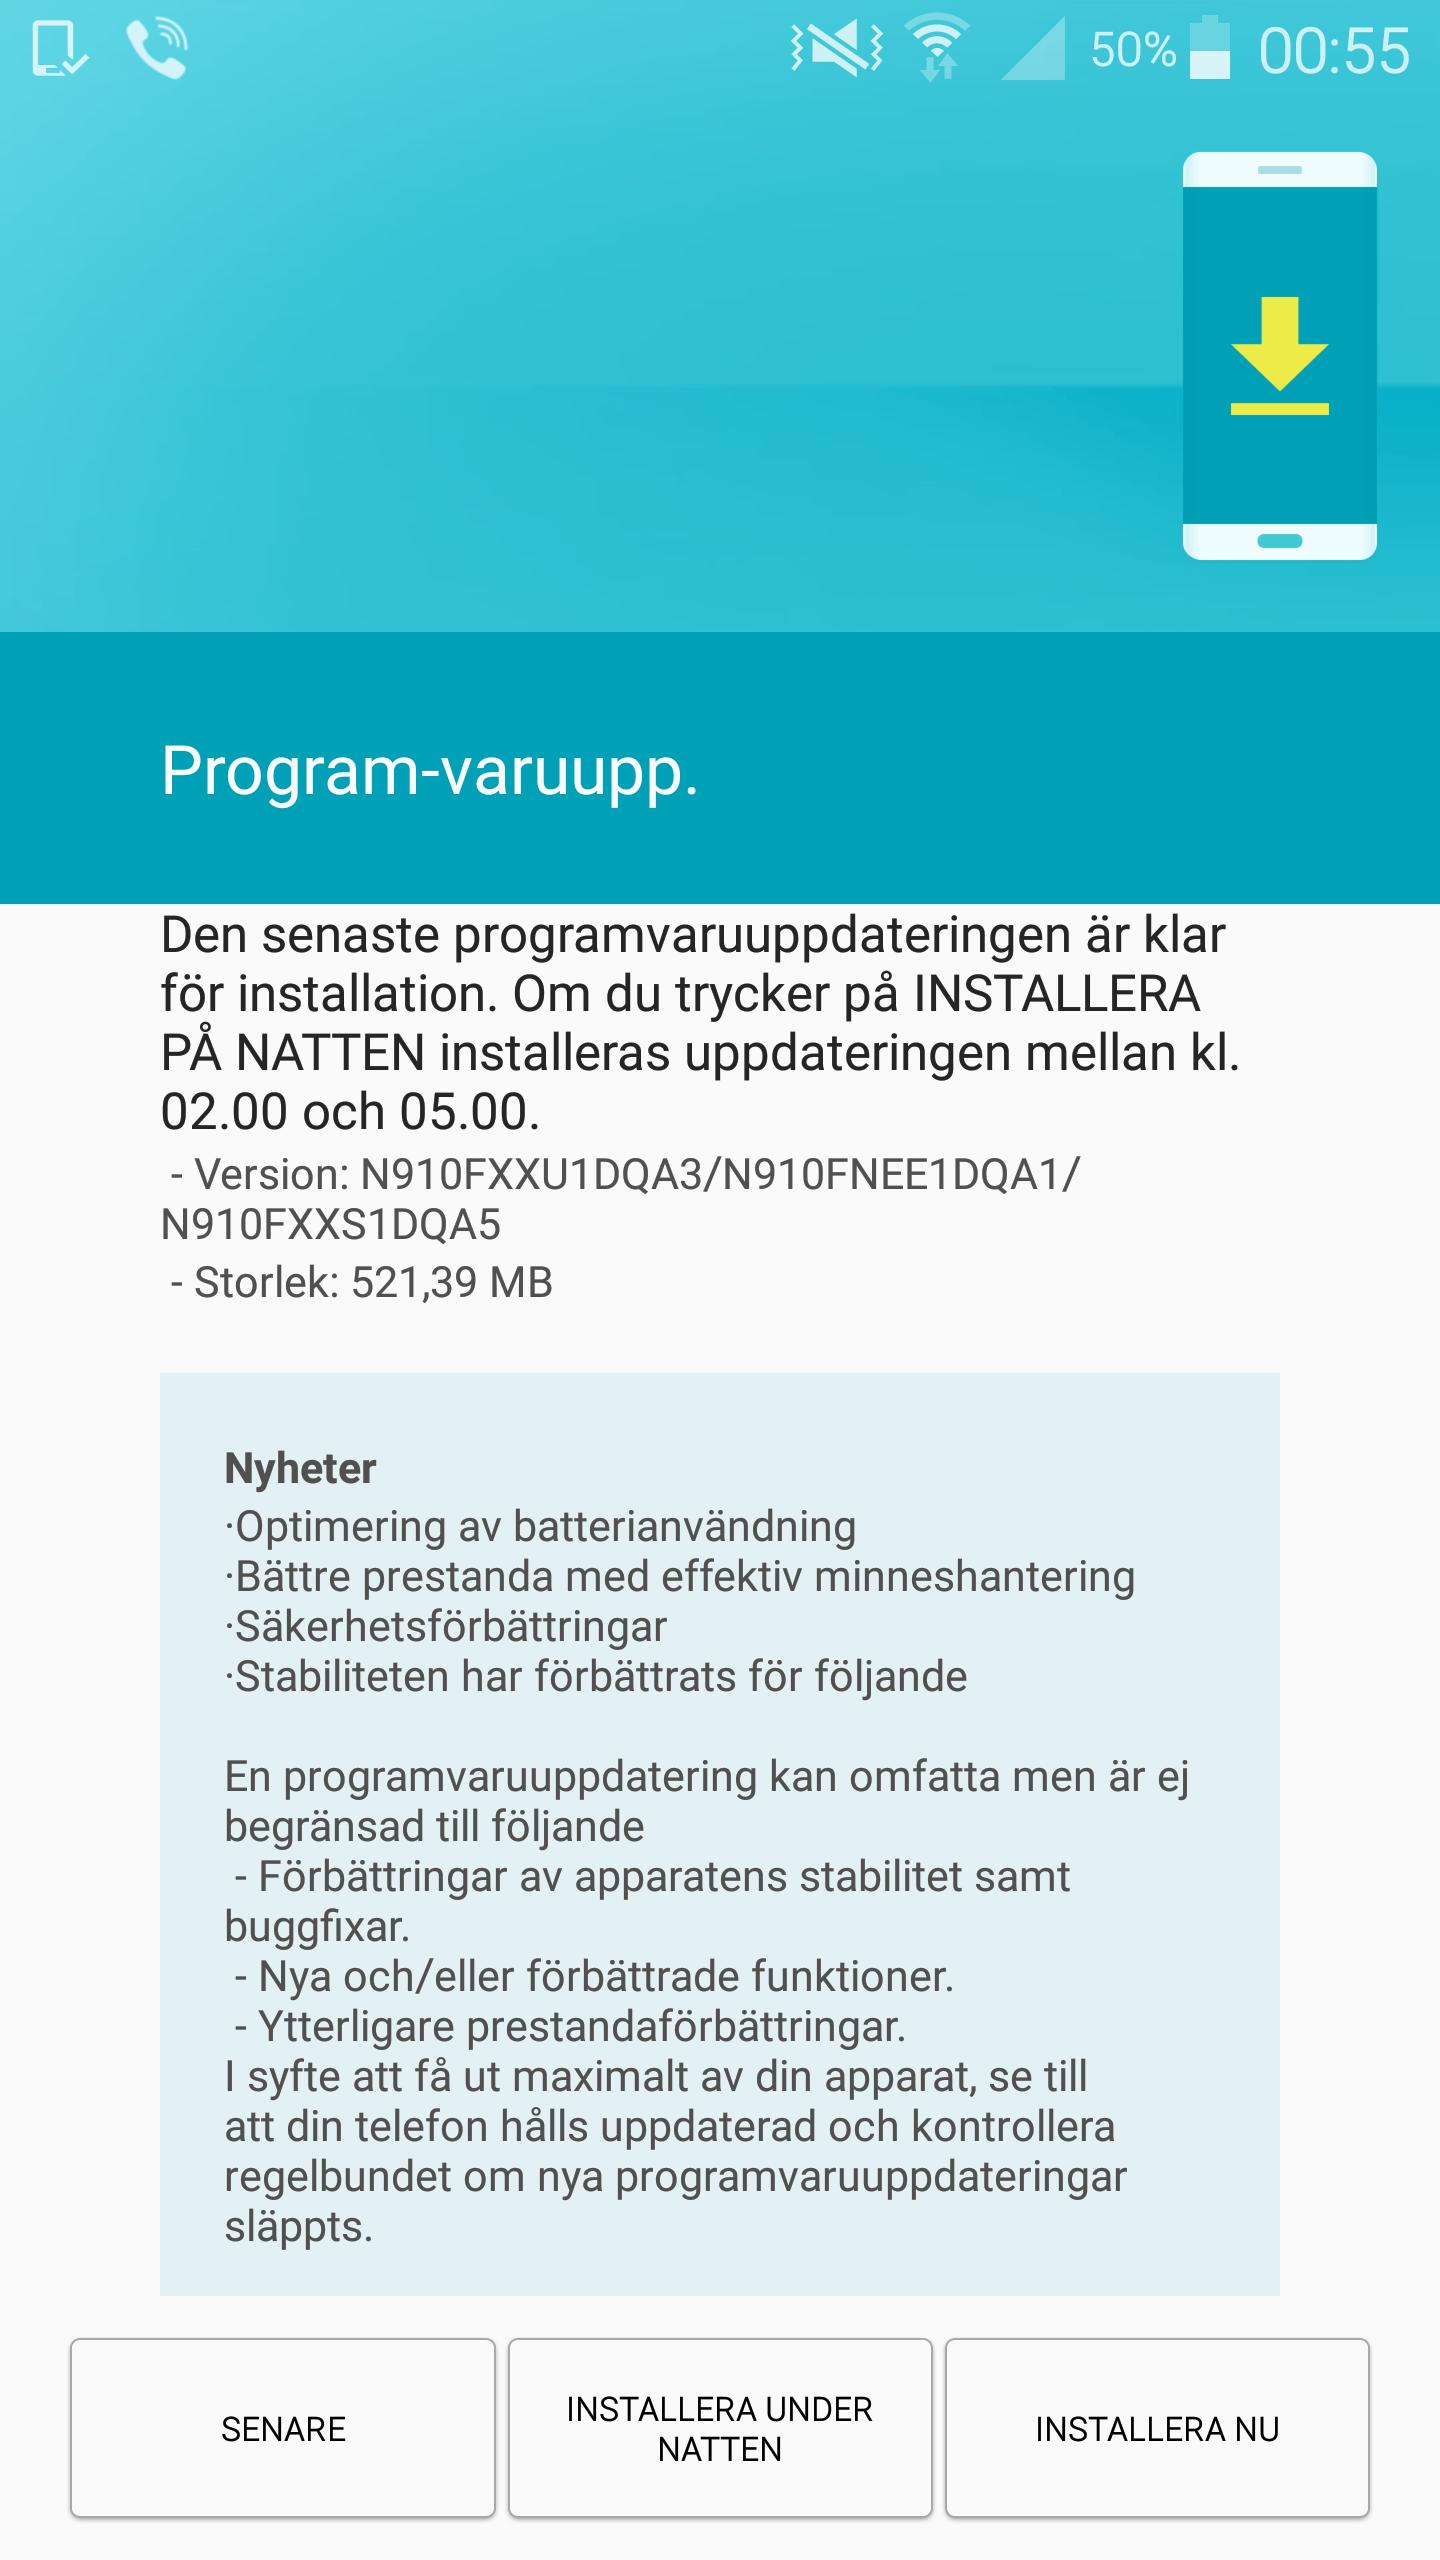 Screenshot_2017-02-04-00-55-51.png